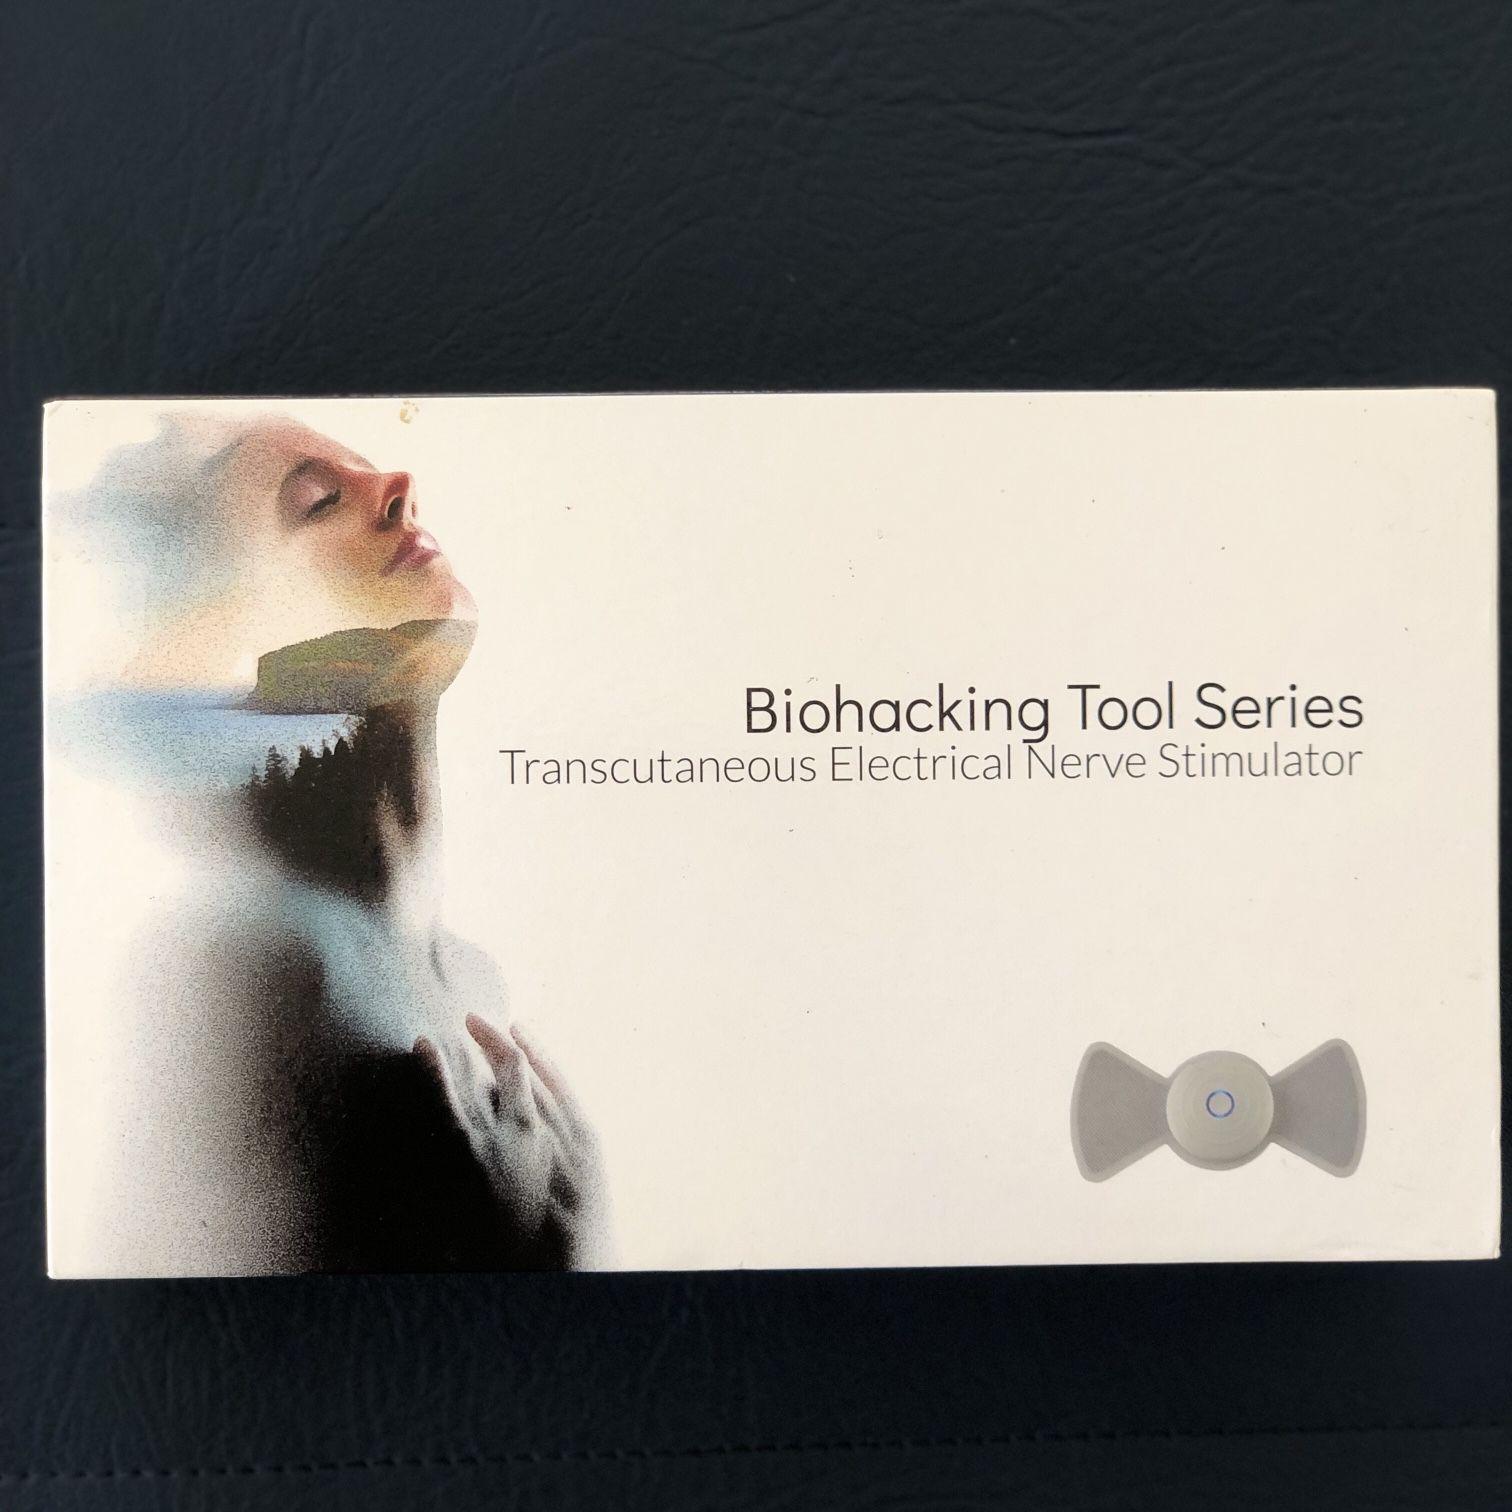 Biohacking Tool Series: Transcutaneous Electrical Nerve Stimulator (TENS)